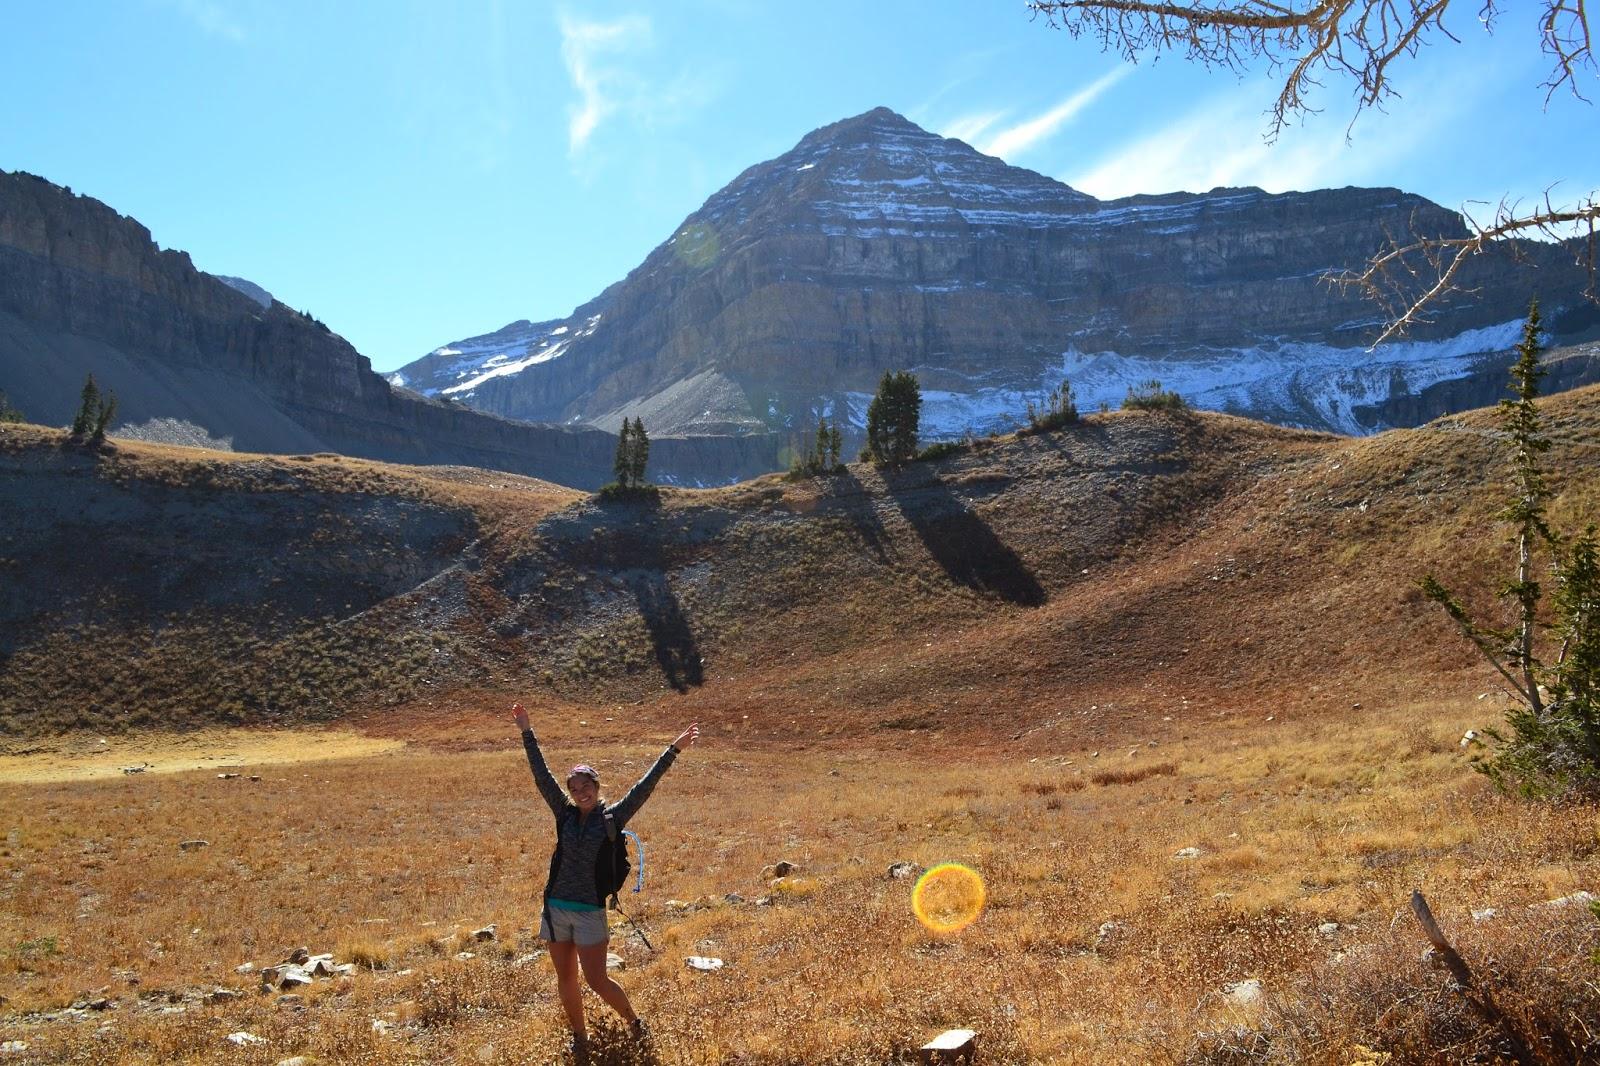 Katie Wanders : Mount Timpanogos, Utah - Hiking to the ...